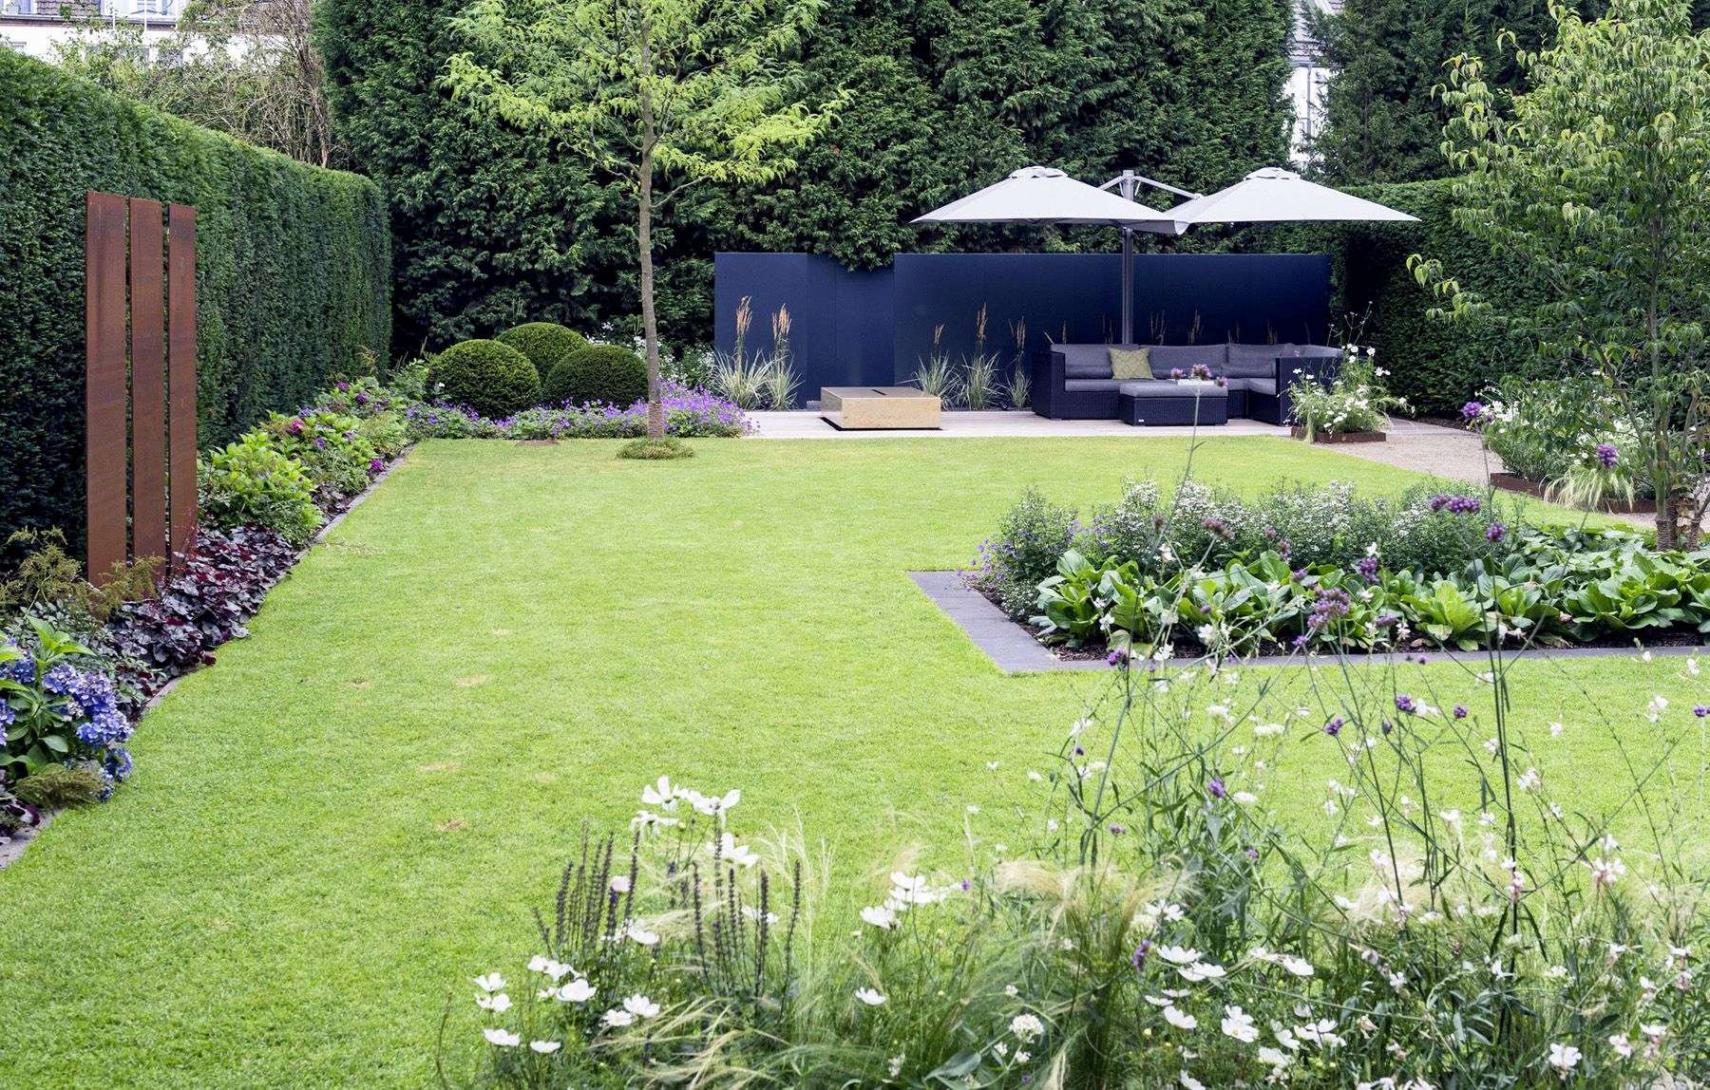 Bauerngarten Gestalten Ideen Neu Alten Garten Neu Anlegen — Temobardz Home Blog